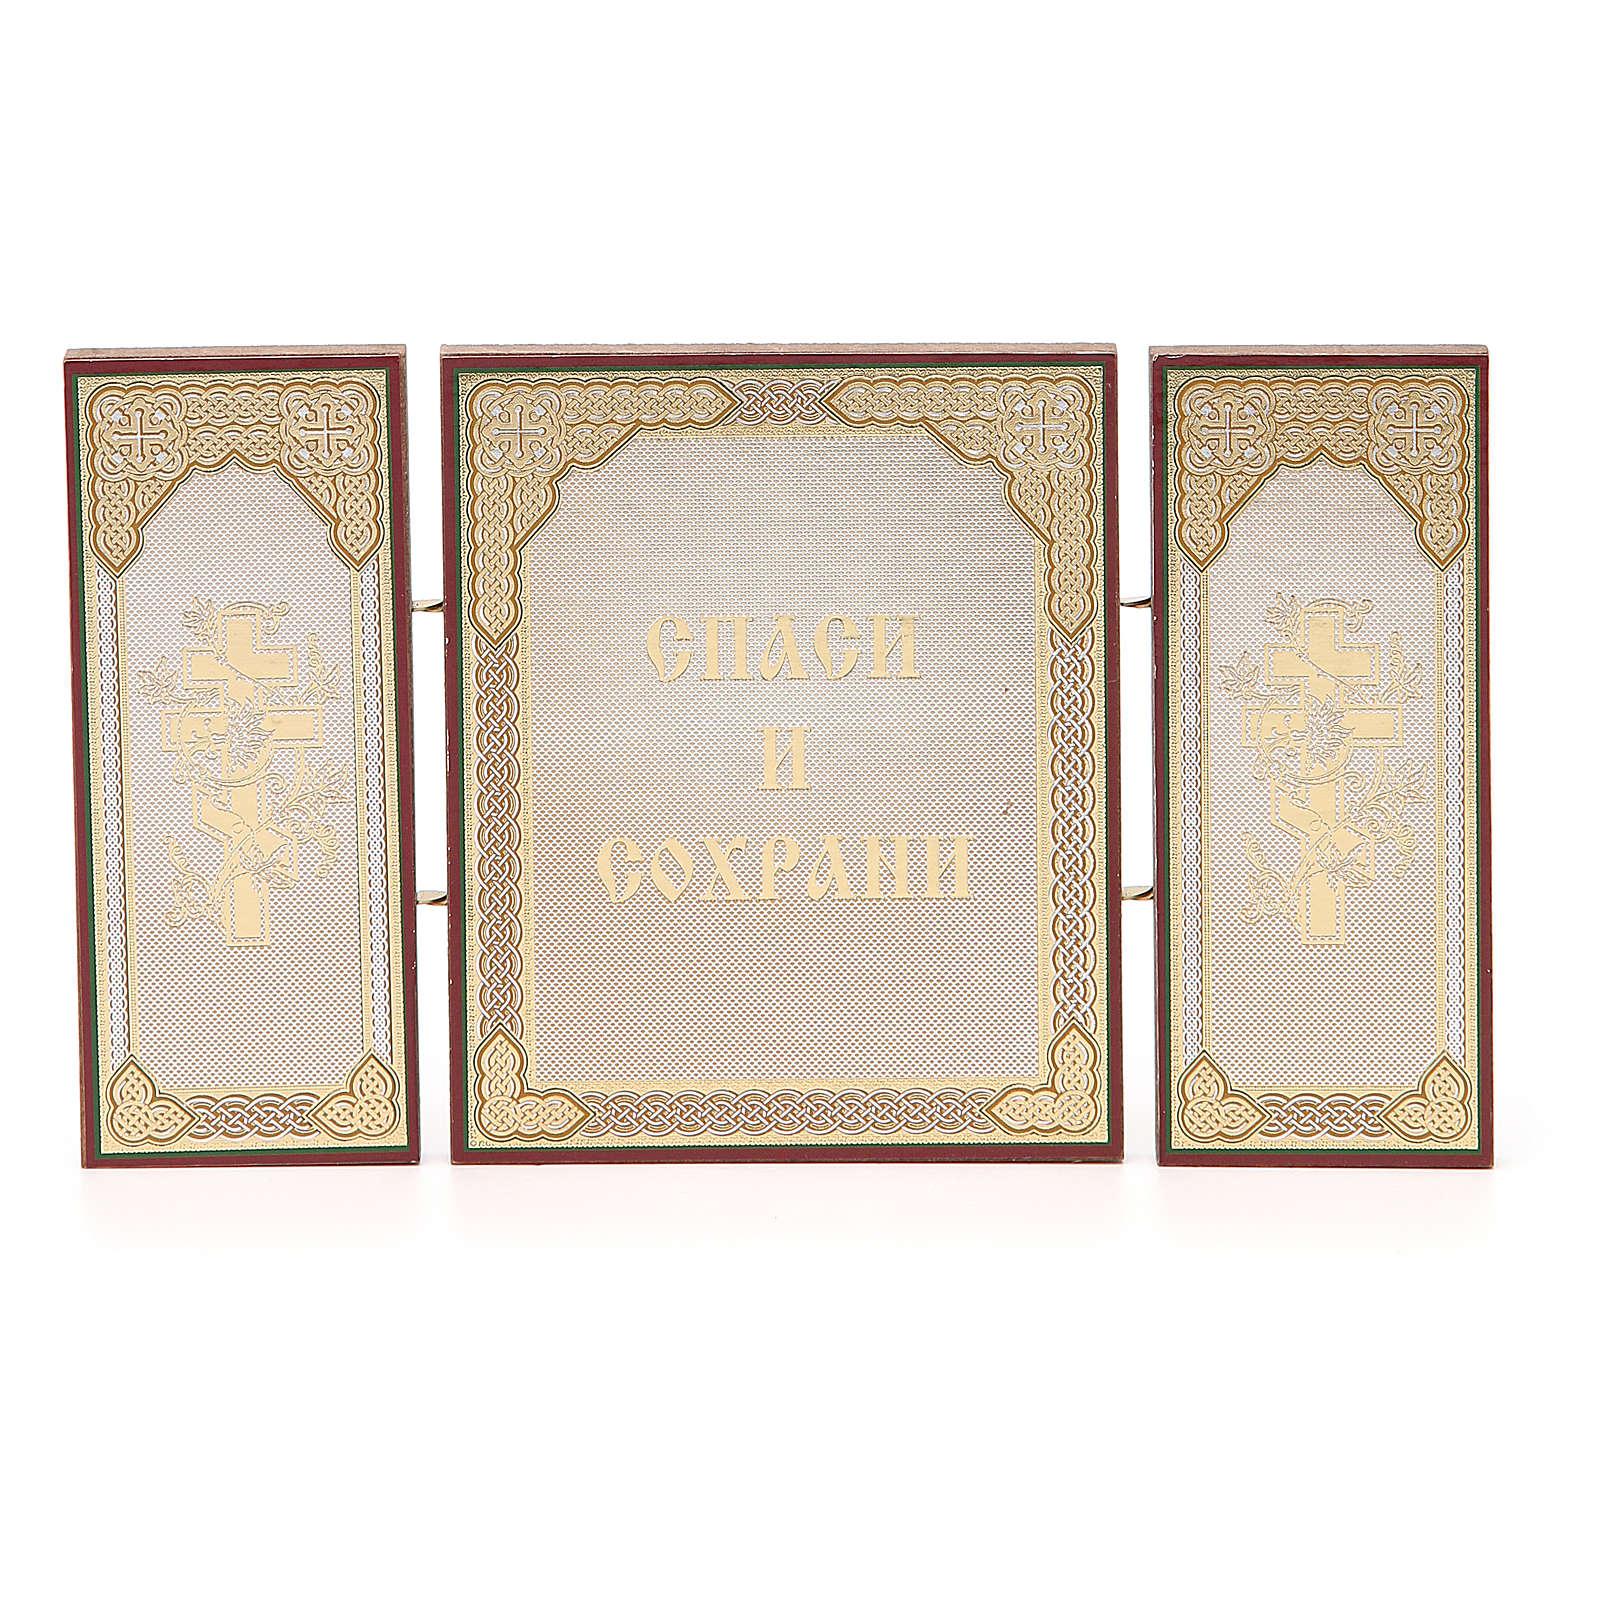 Trittico Russia legno Zhirovitskaya 21x12 3